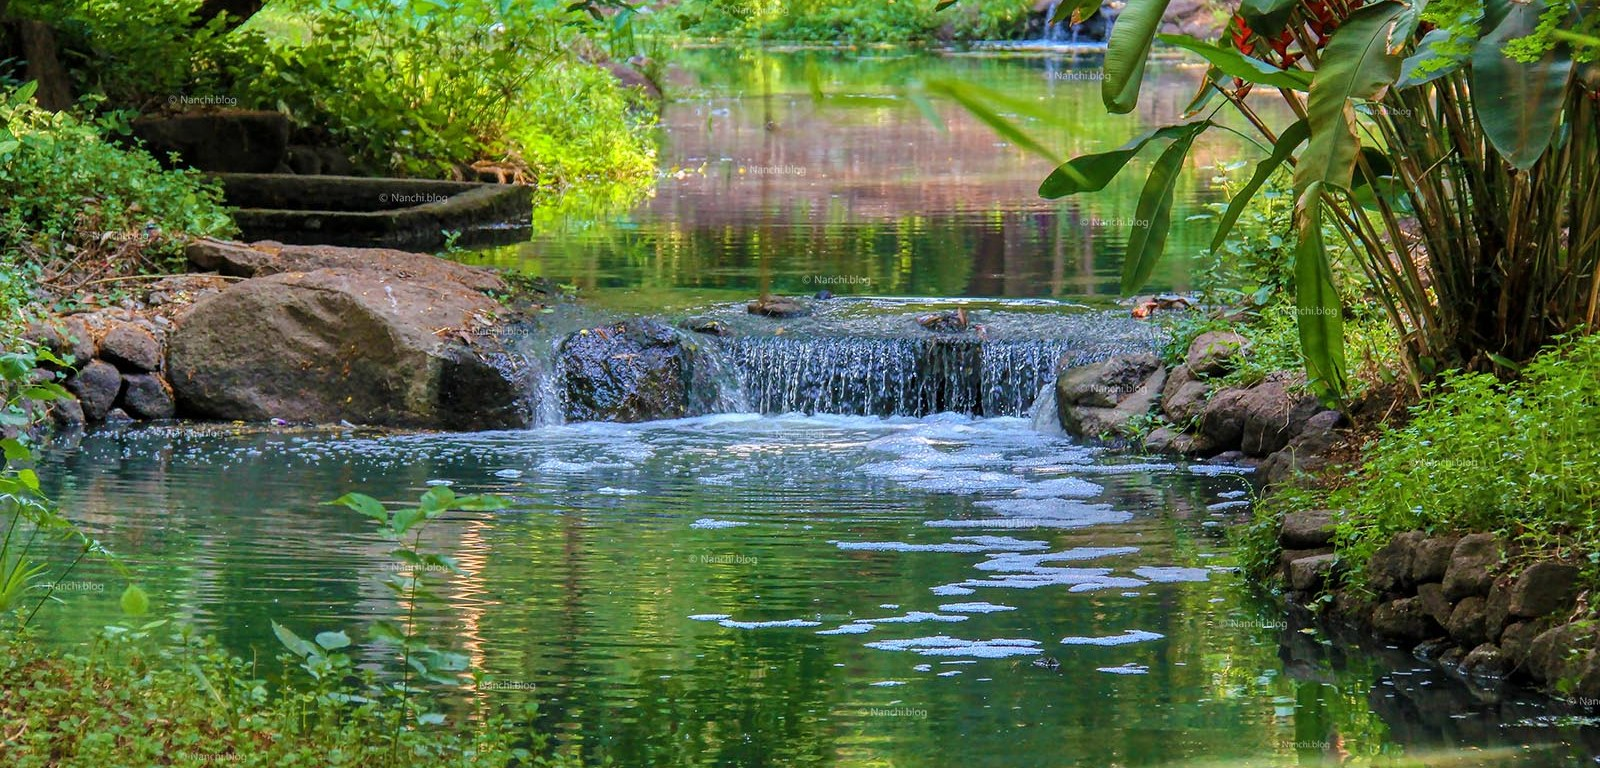 Osho Garden, Koregaon Park, Pune